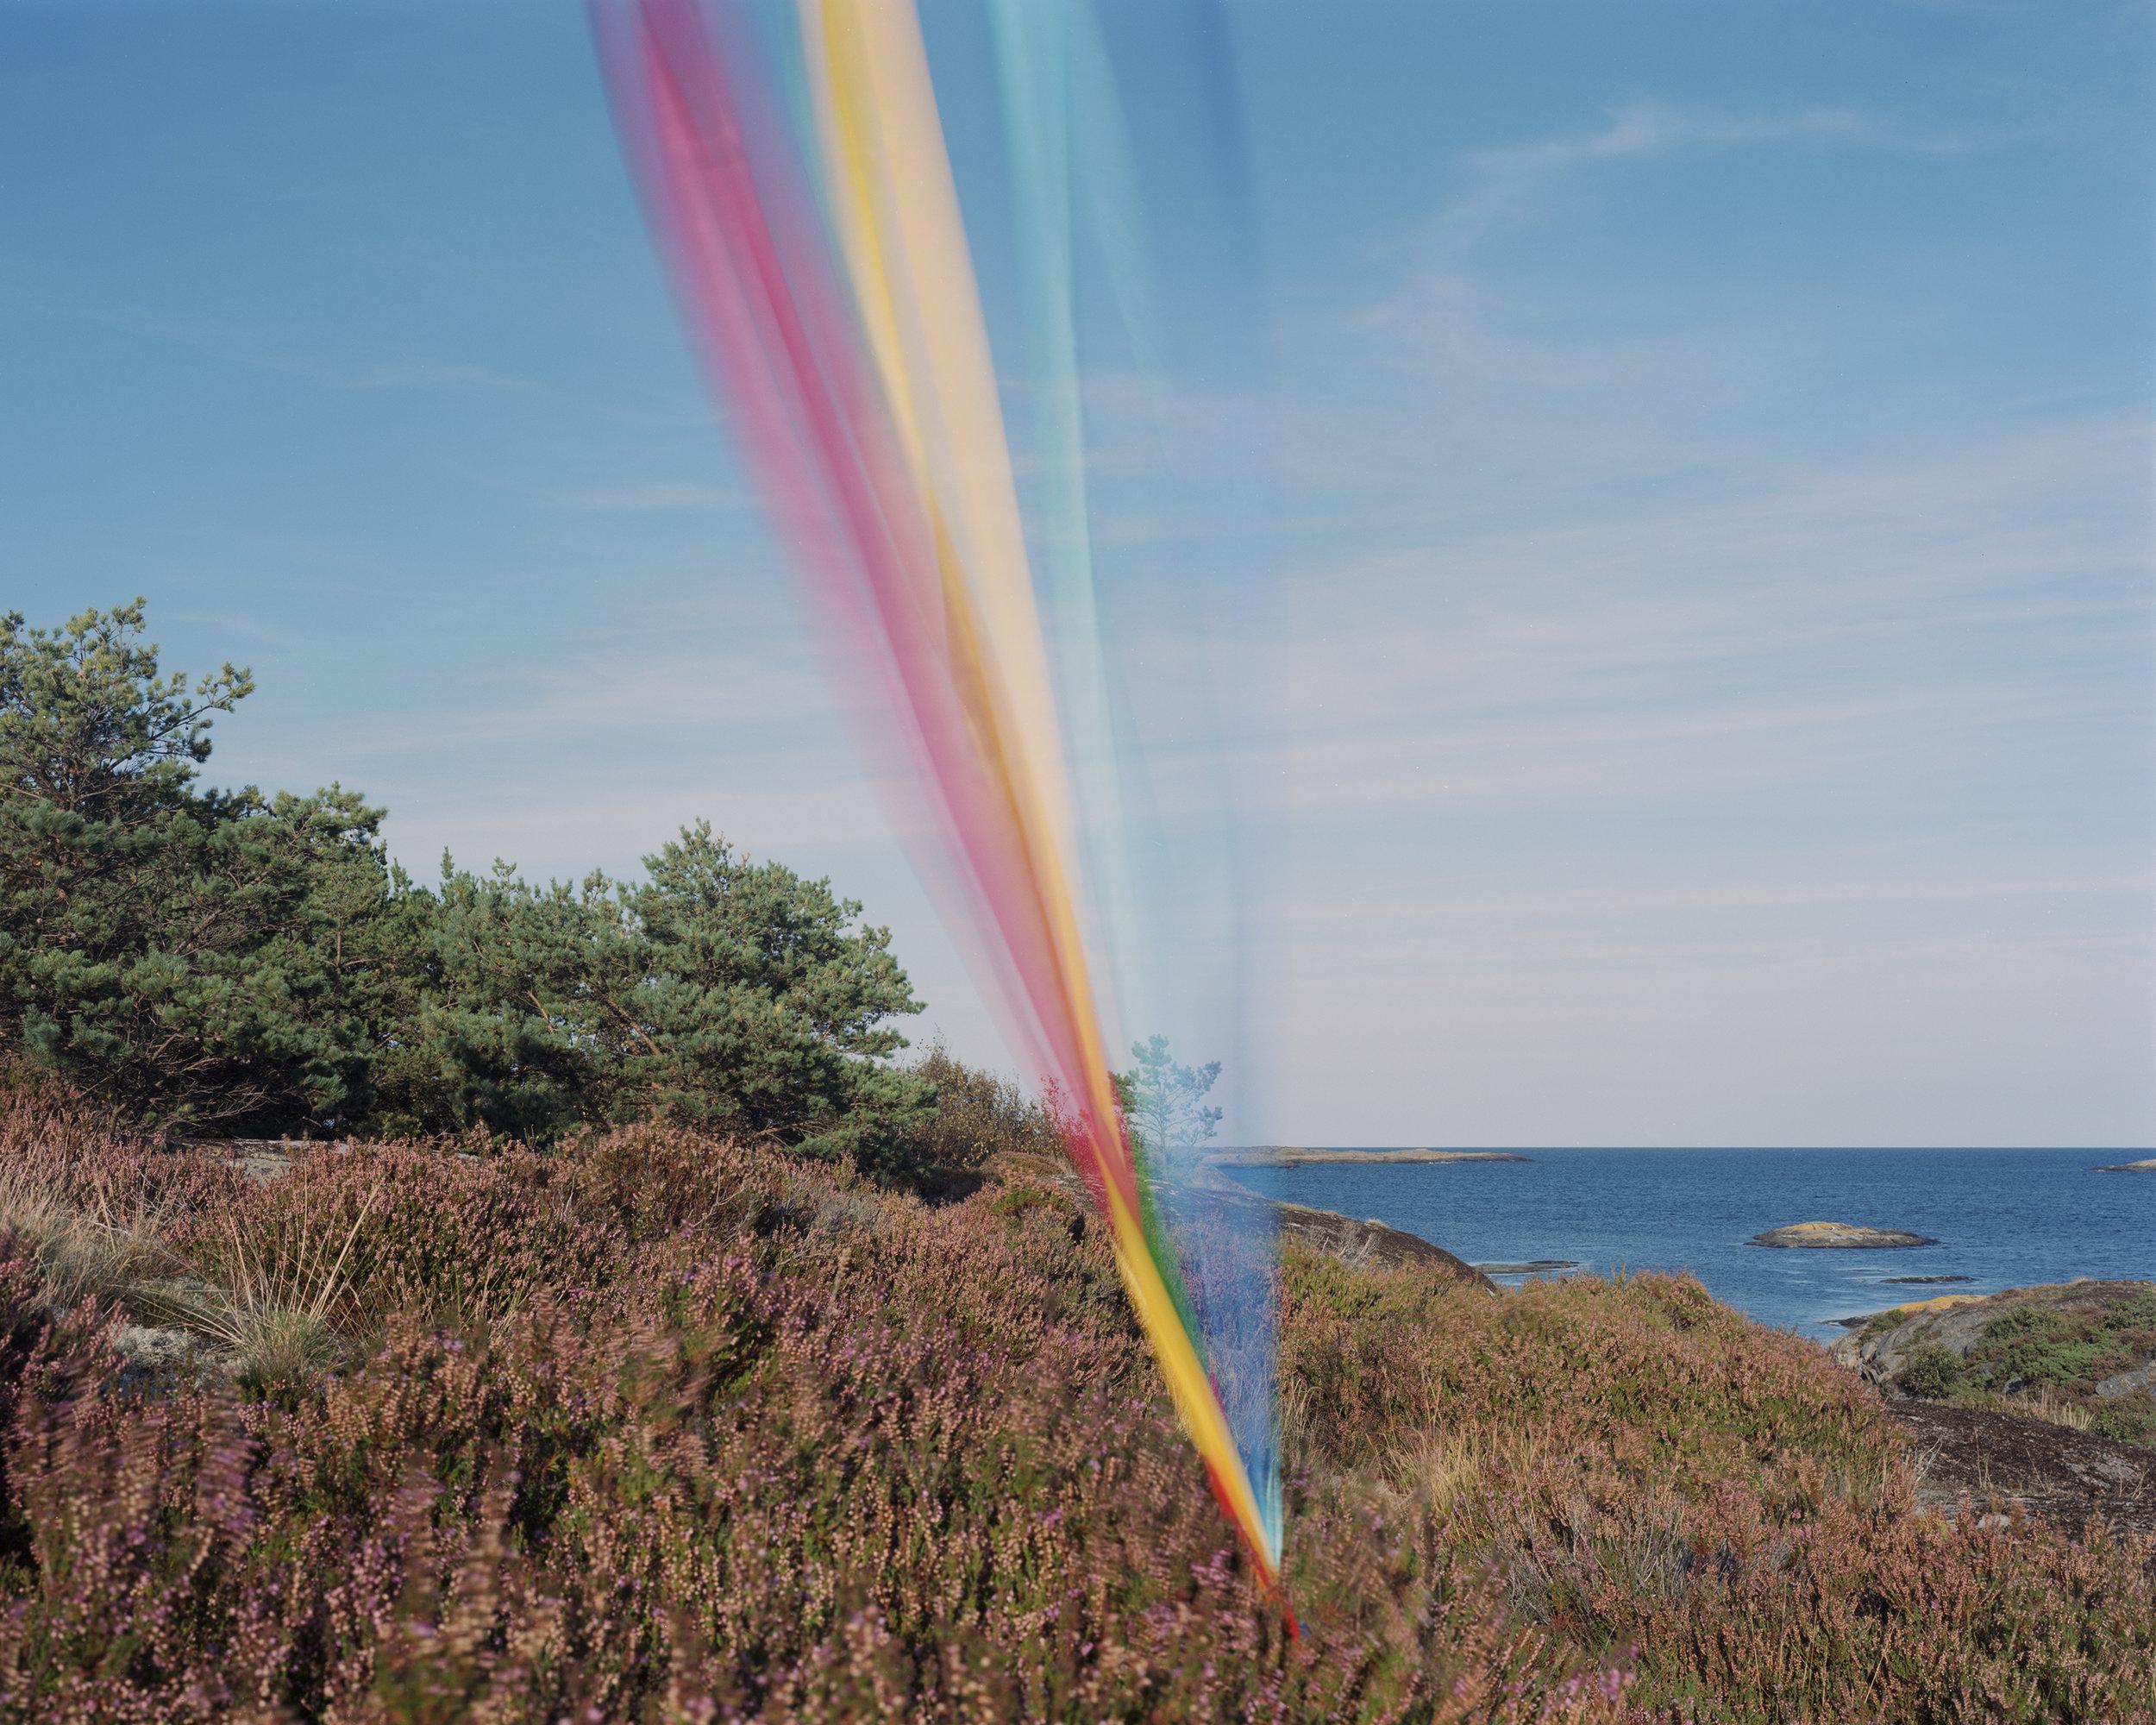 String, cloth and kite #07 2016 C-print, analog 1/18